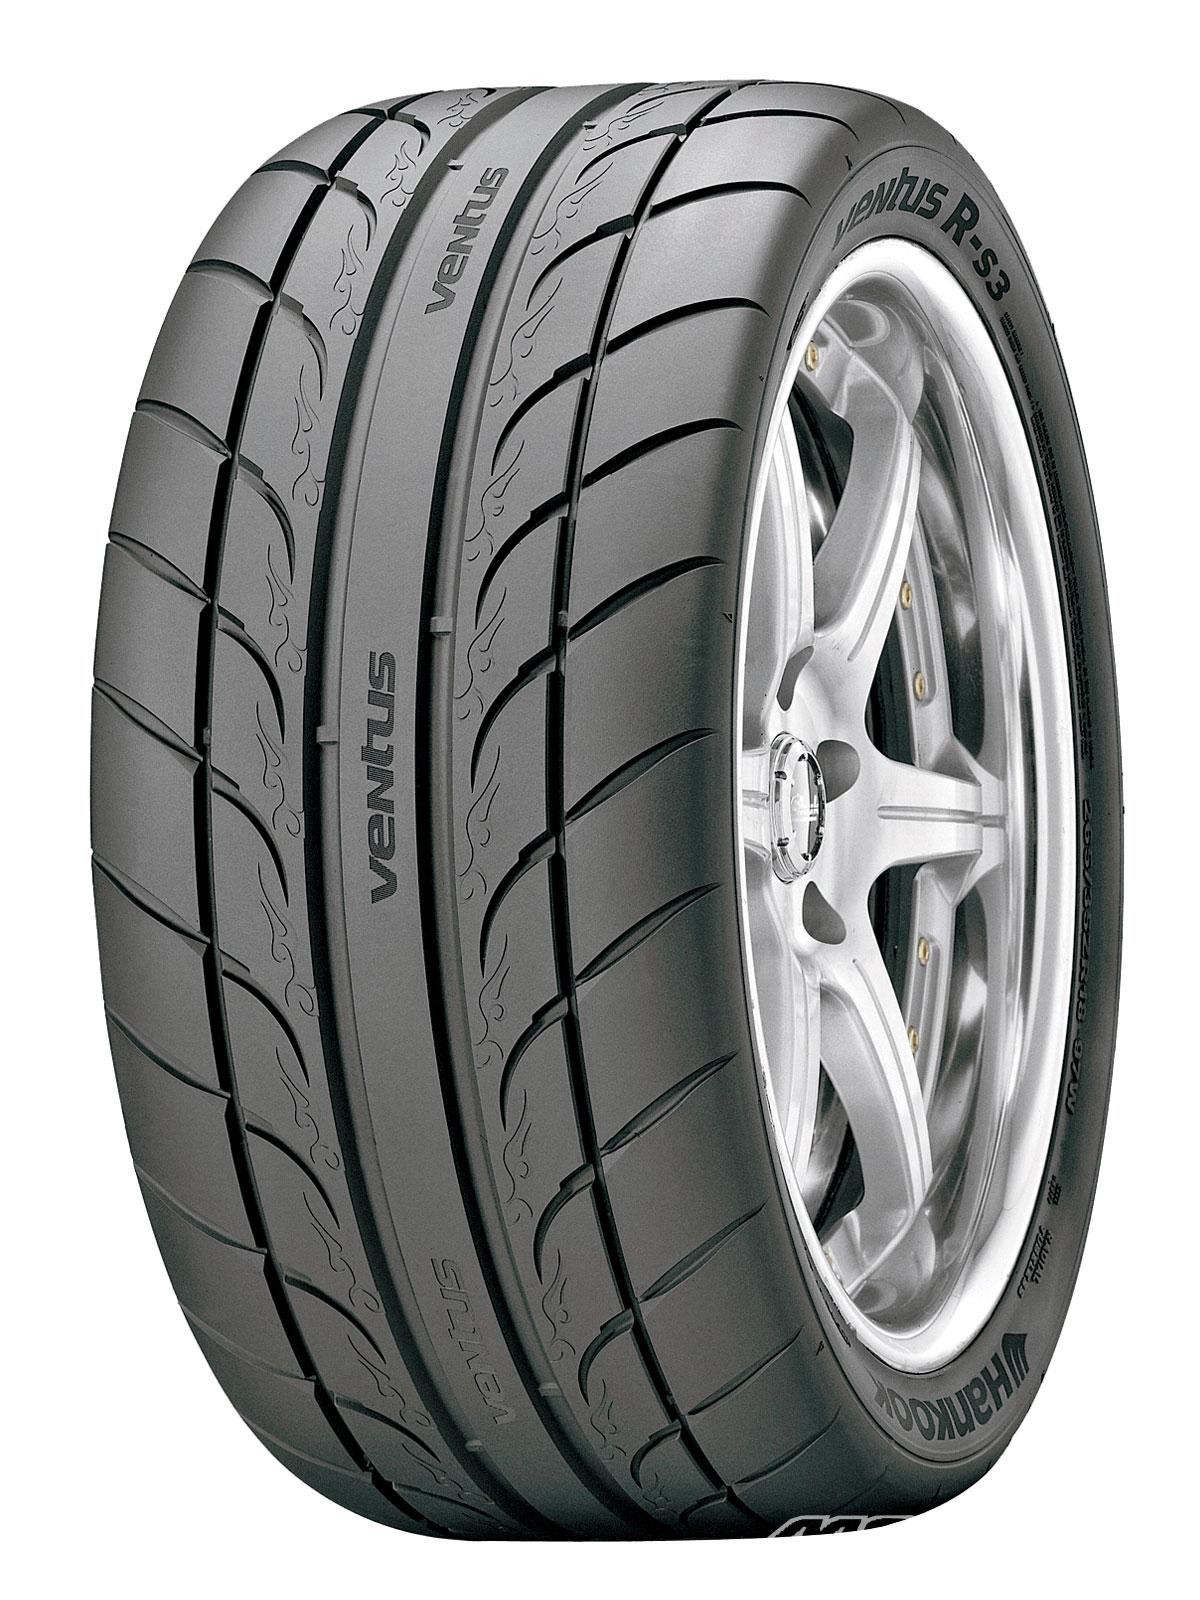 66-performance-tire